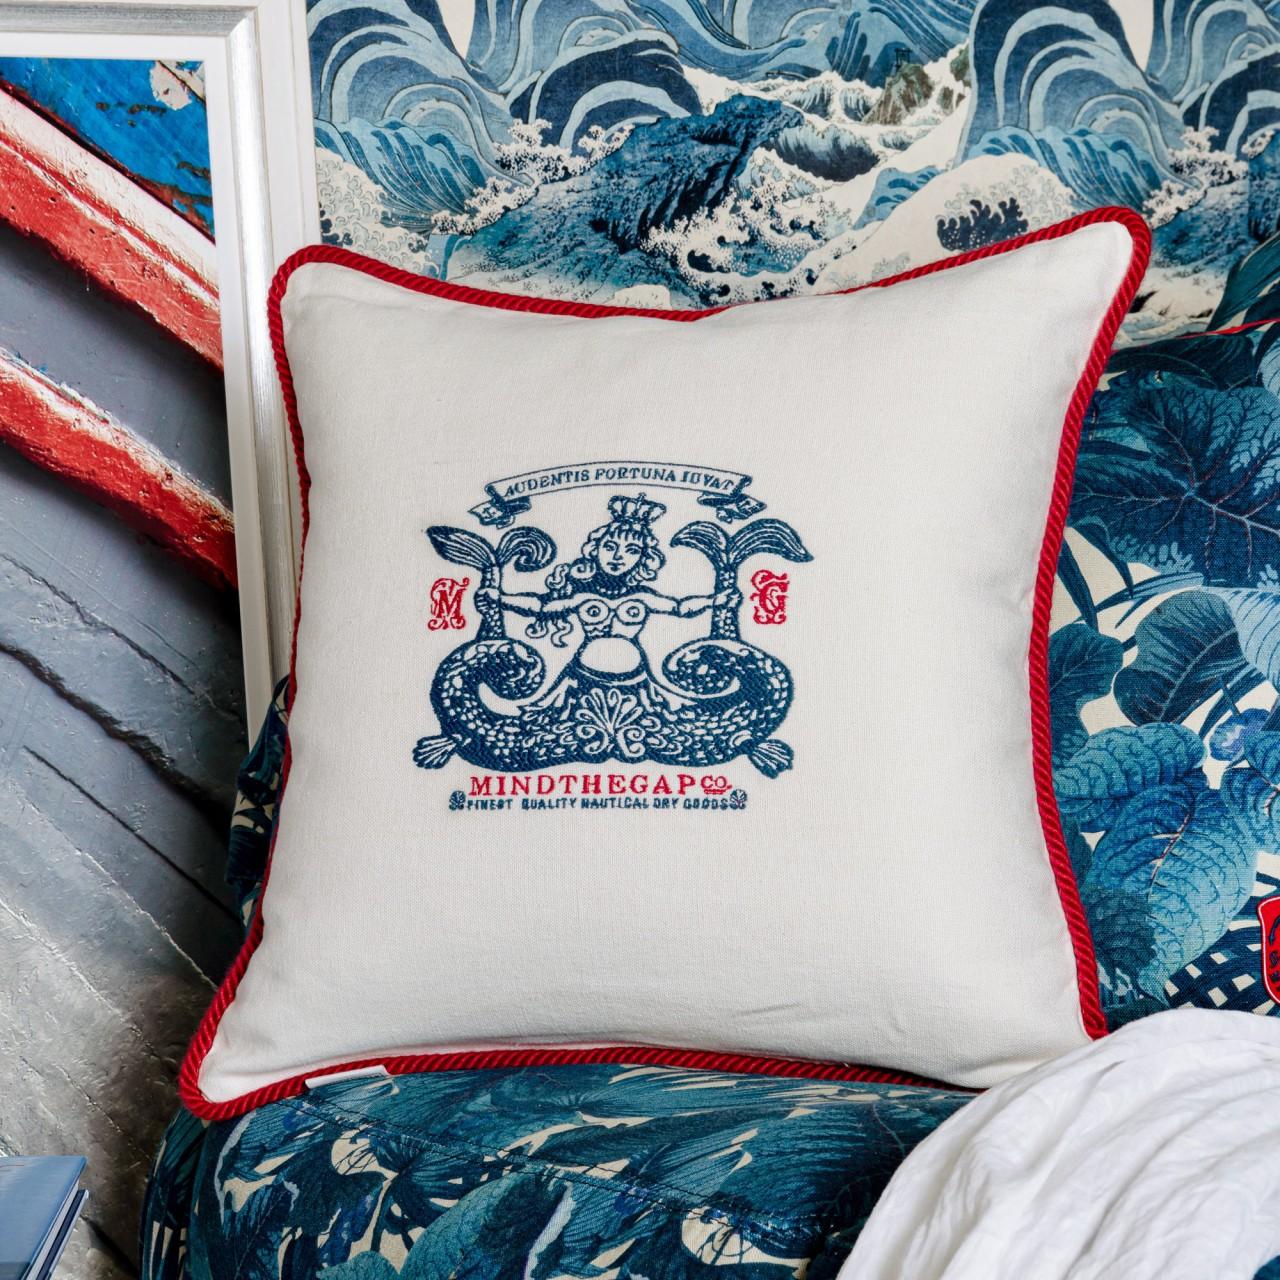 SIREN Linen Embroidered Cushion